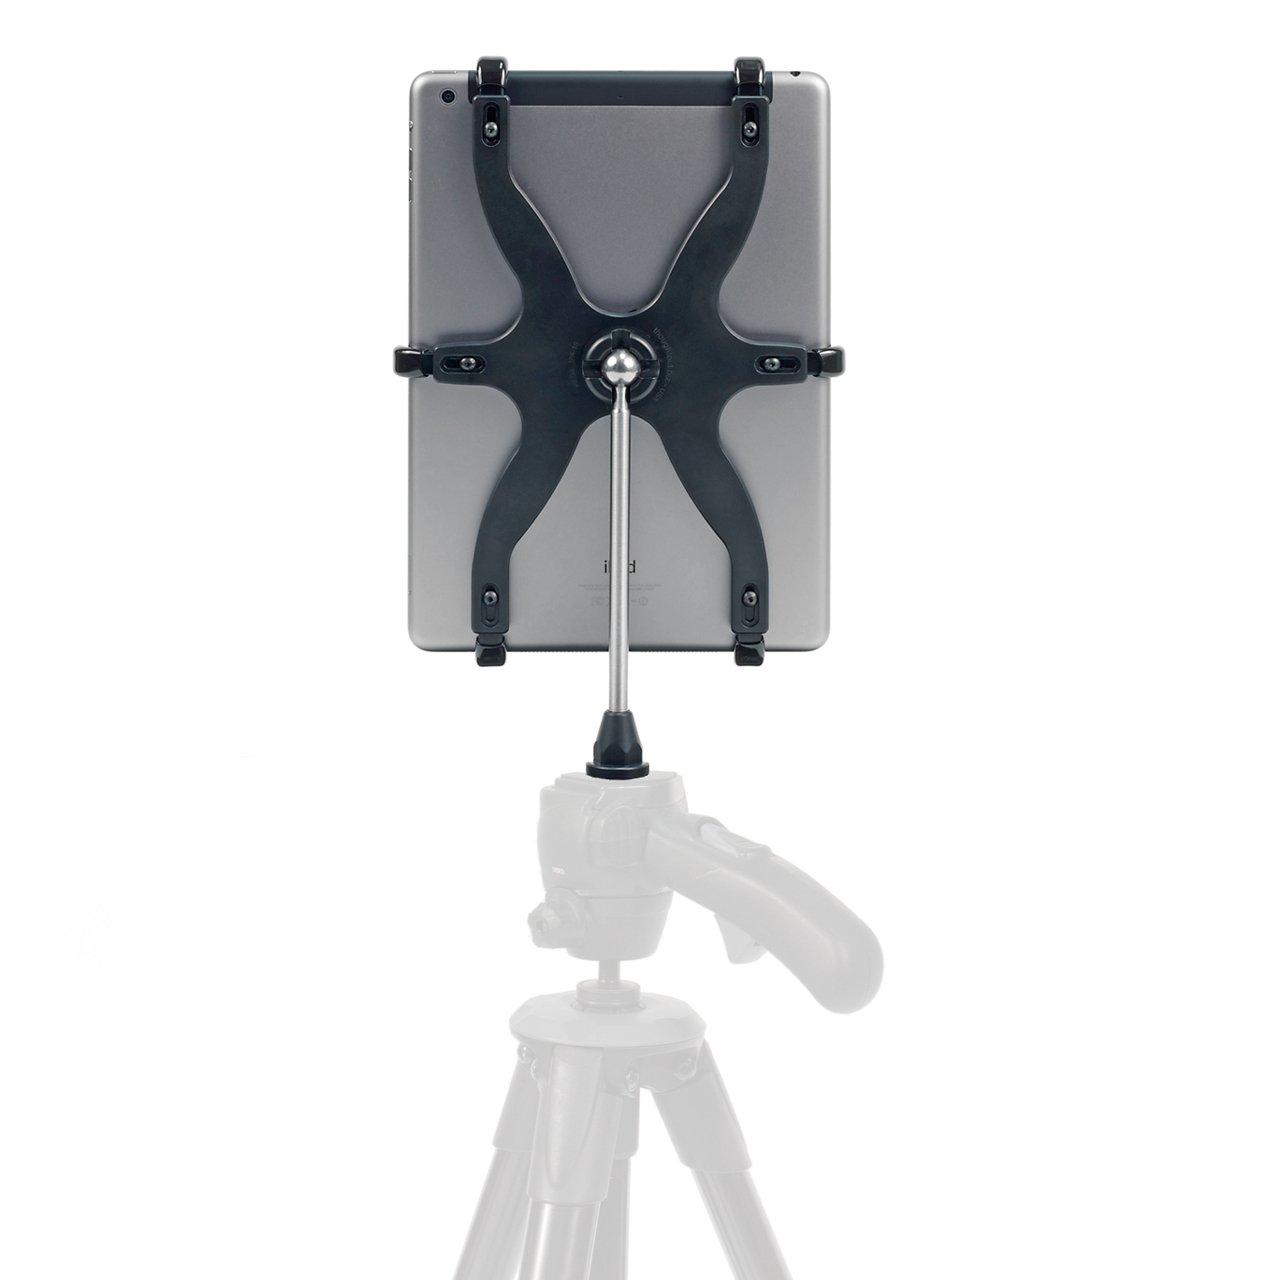 Thought Out PED4 Planet IPA10 - iPad Stand Pivoting (iPad Pro 9.7, iPad Air 2, iPad Air)